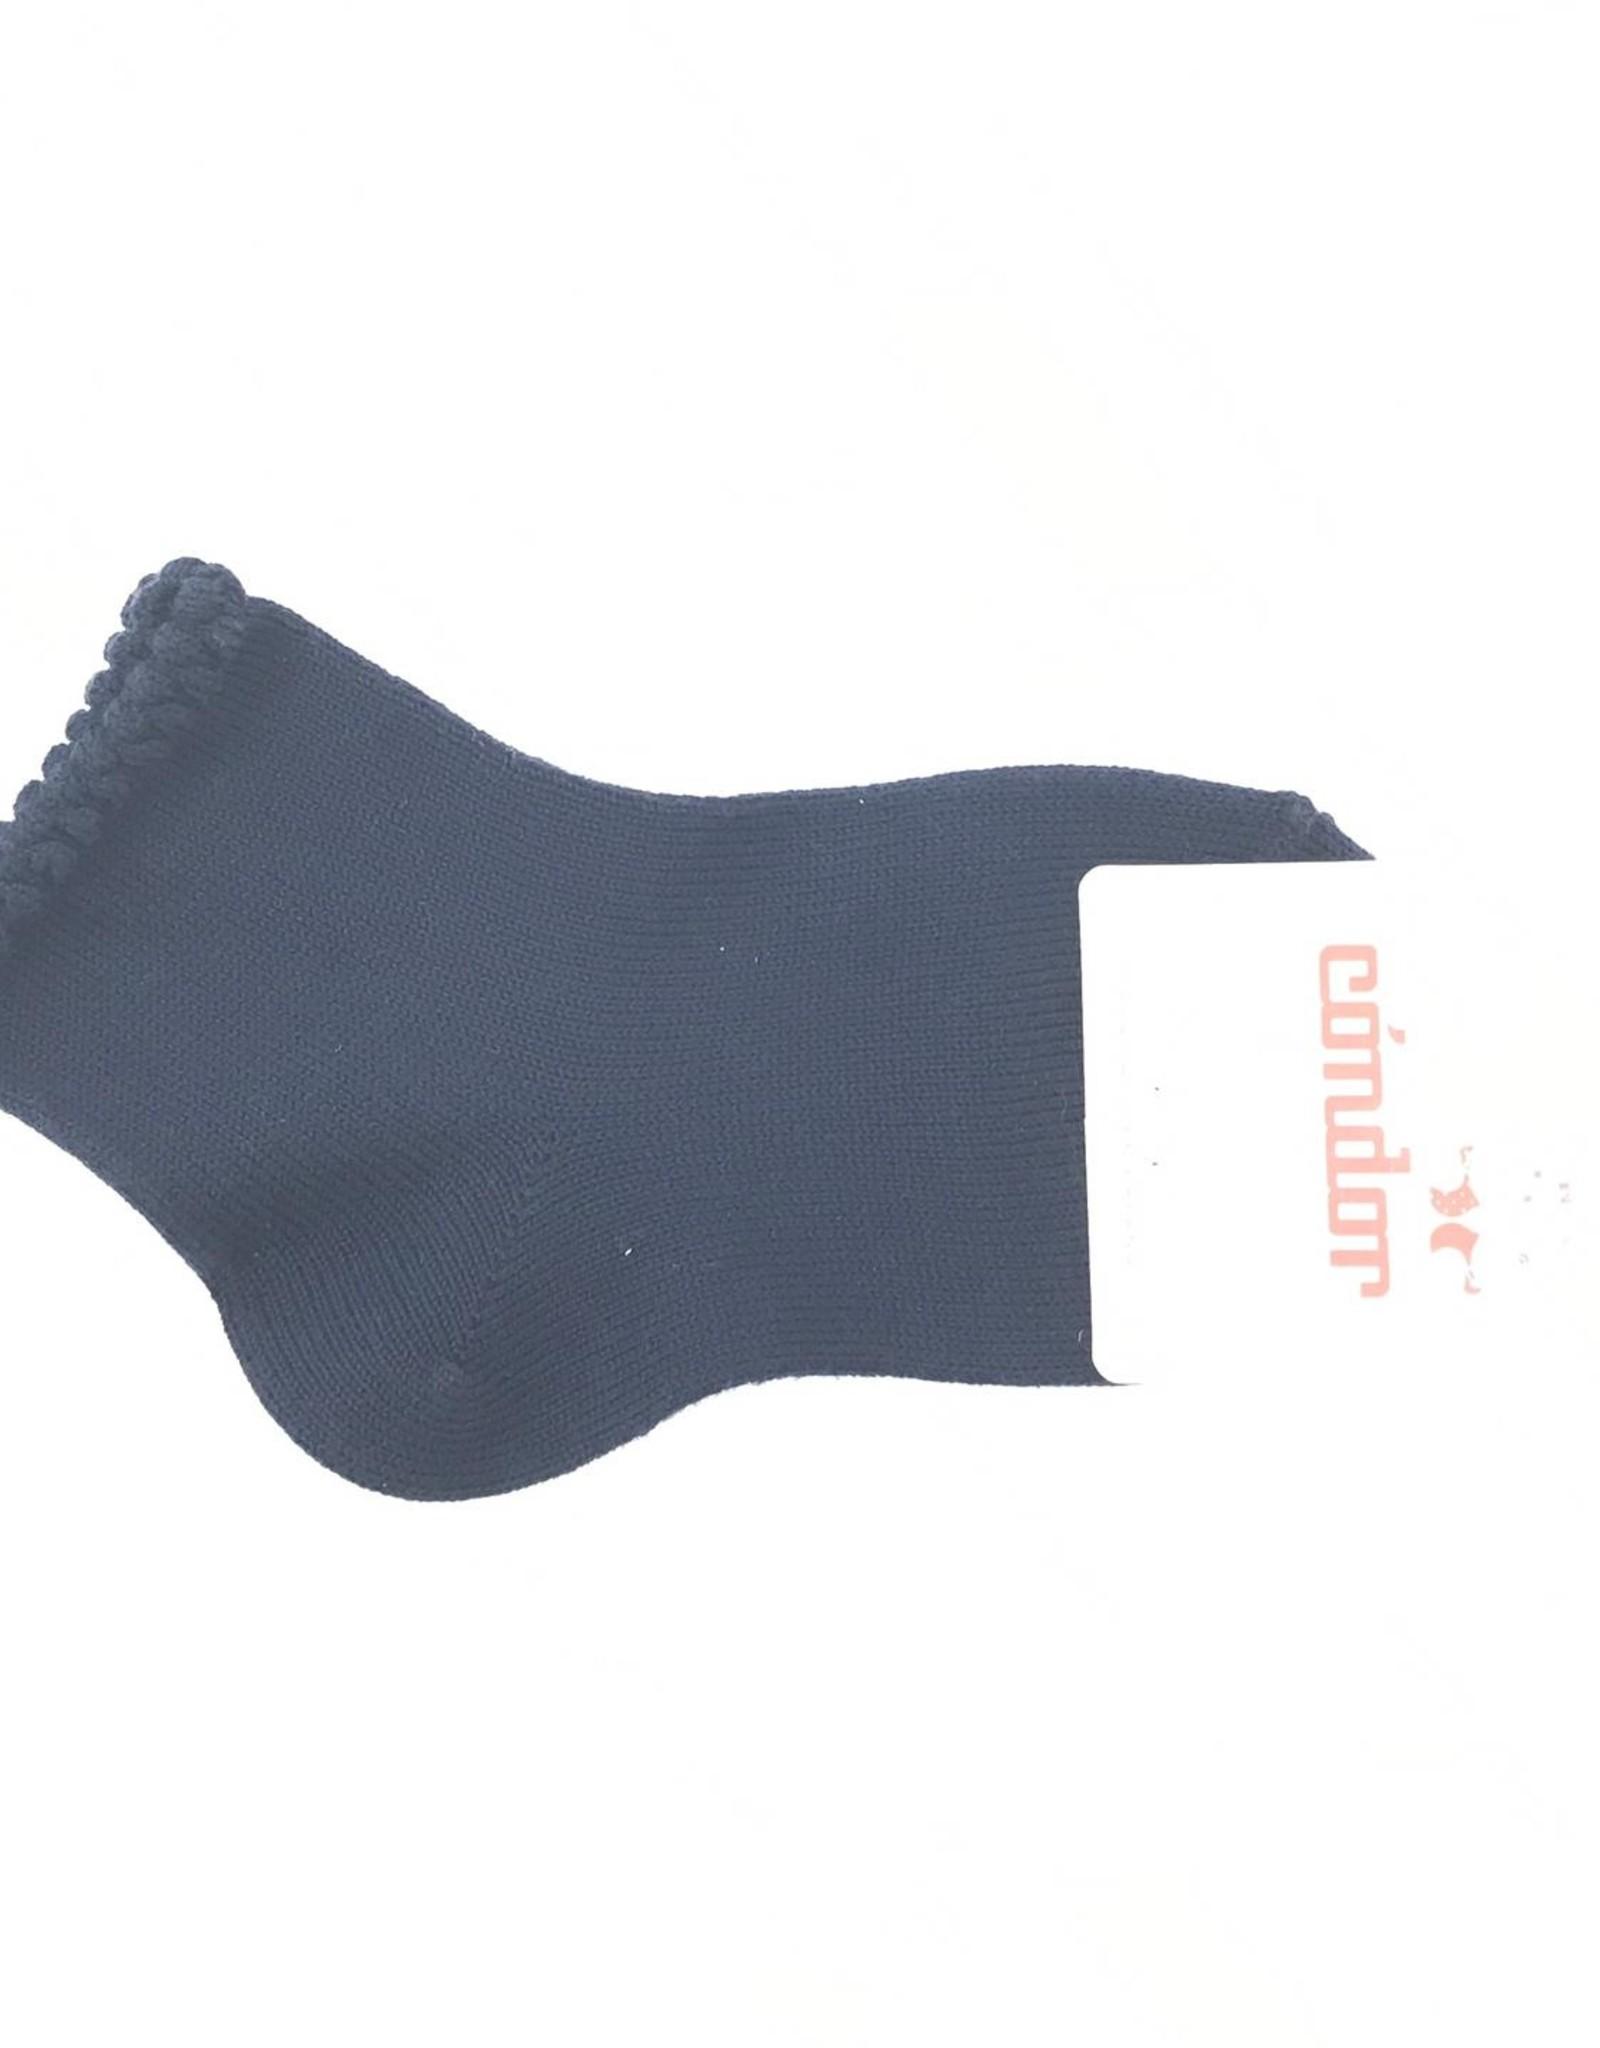 Condor Condor Curl Anklet Sock